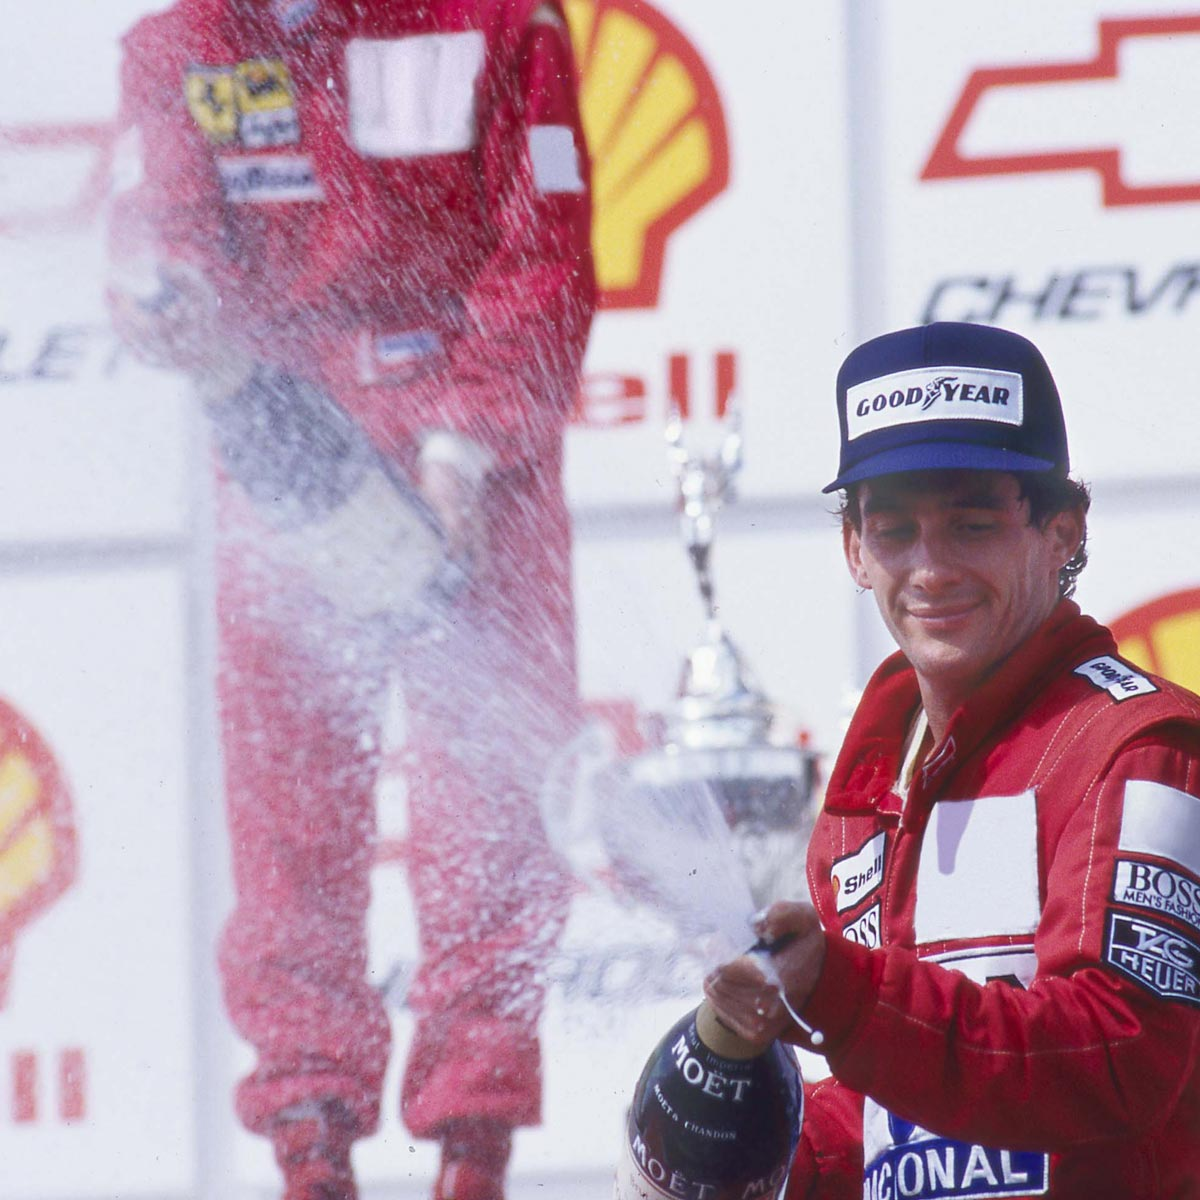 La Cote des Montres : Photo - TAG Heuer Chronographe Tourbillon Edition Spéciale Ayrton Senna